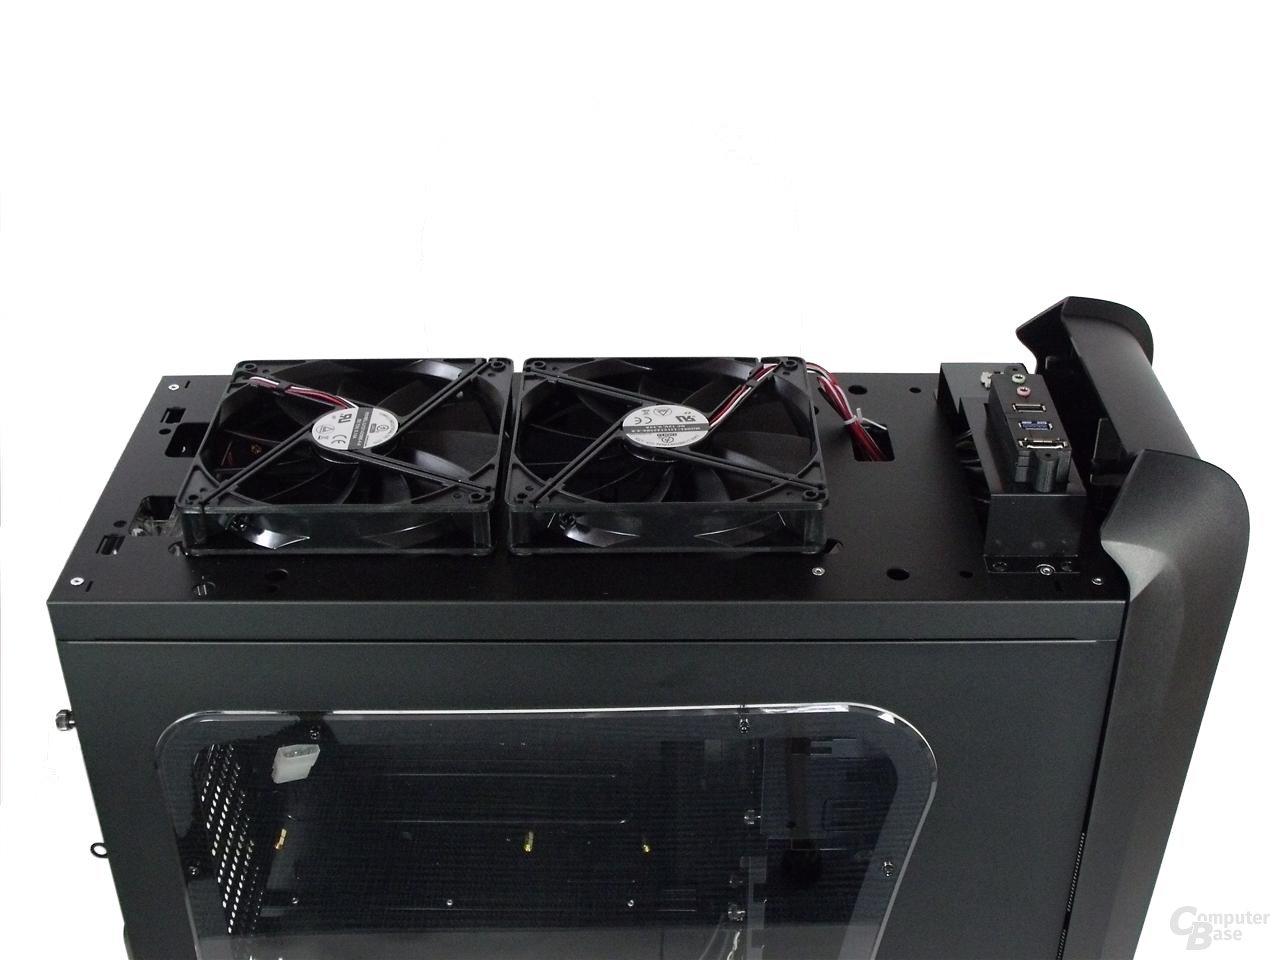 LanCool PC-K63 – Deckel ohne Top-Cover